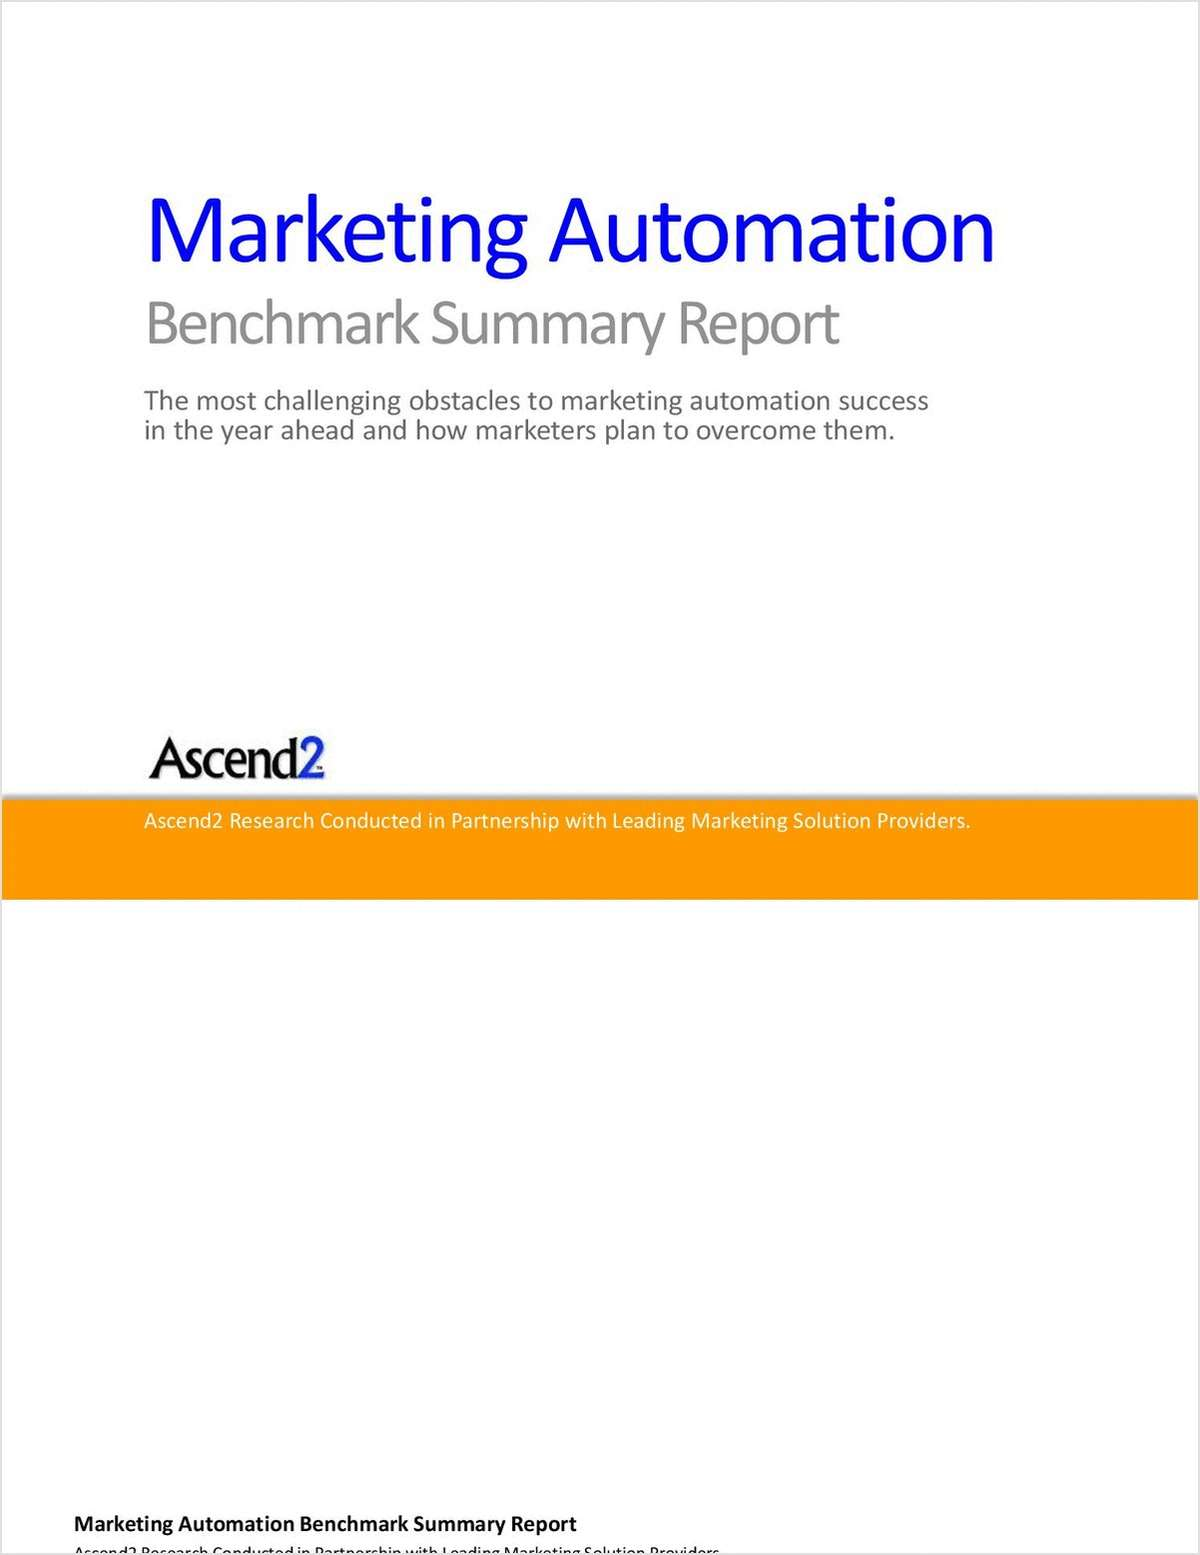 Marketing Automation -- Benchmark Summary Report